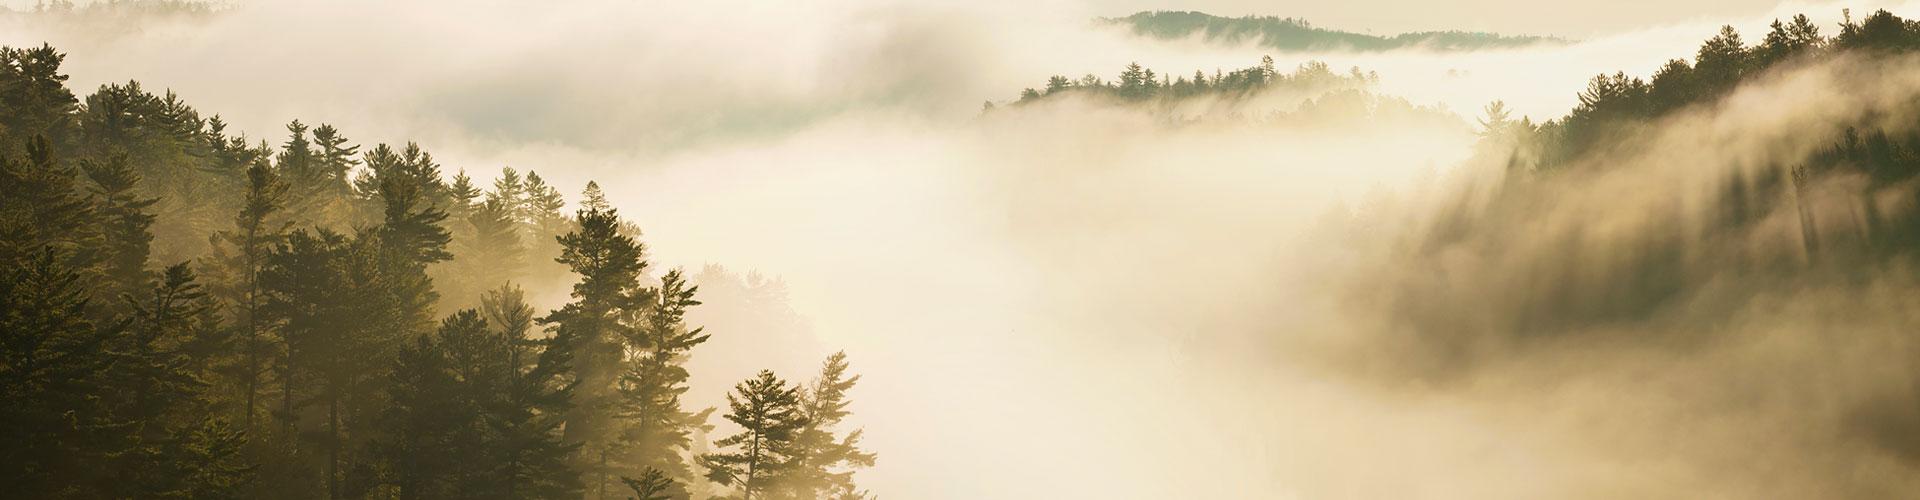 mn-misty-woods